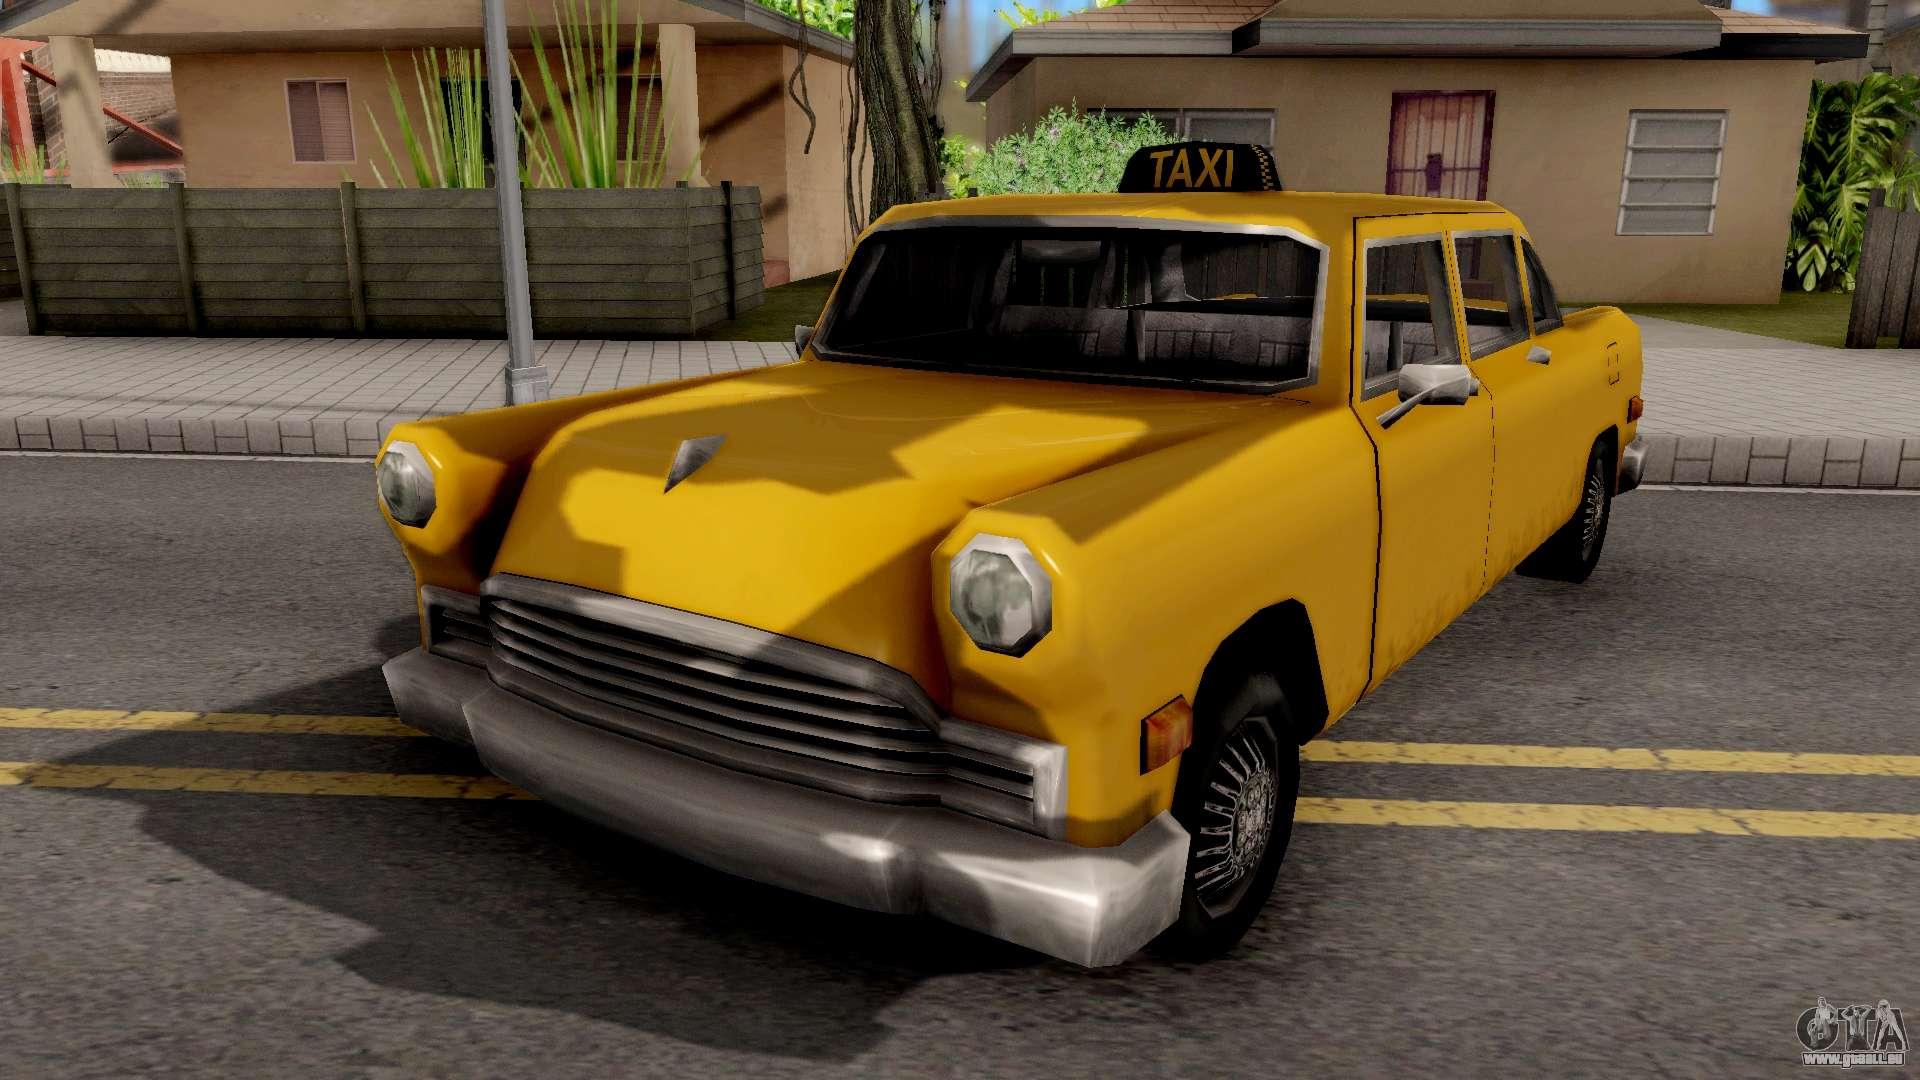 Cabbie New Texture Gta San Andreas | HD Wallpaper 4K